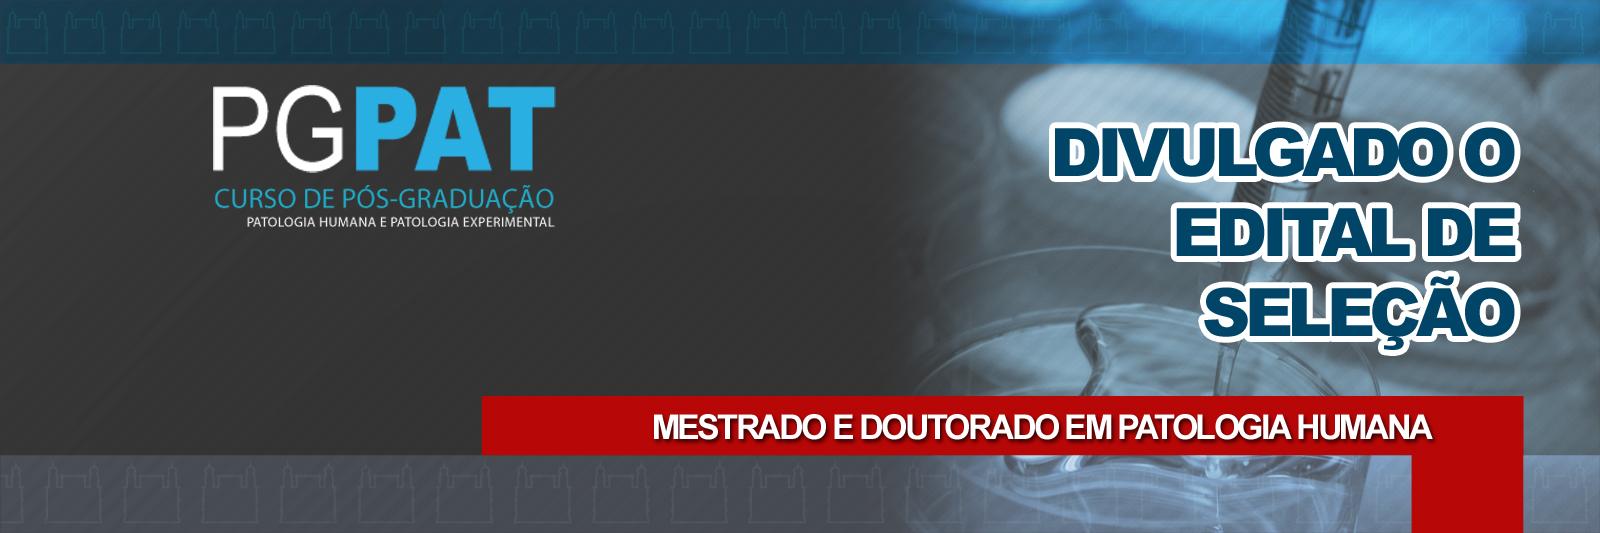 PGPAT MESTRADO DOUTORADO